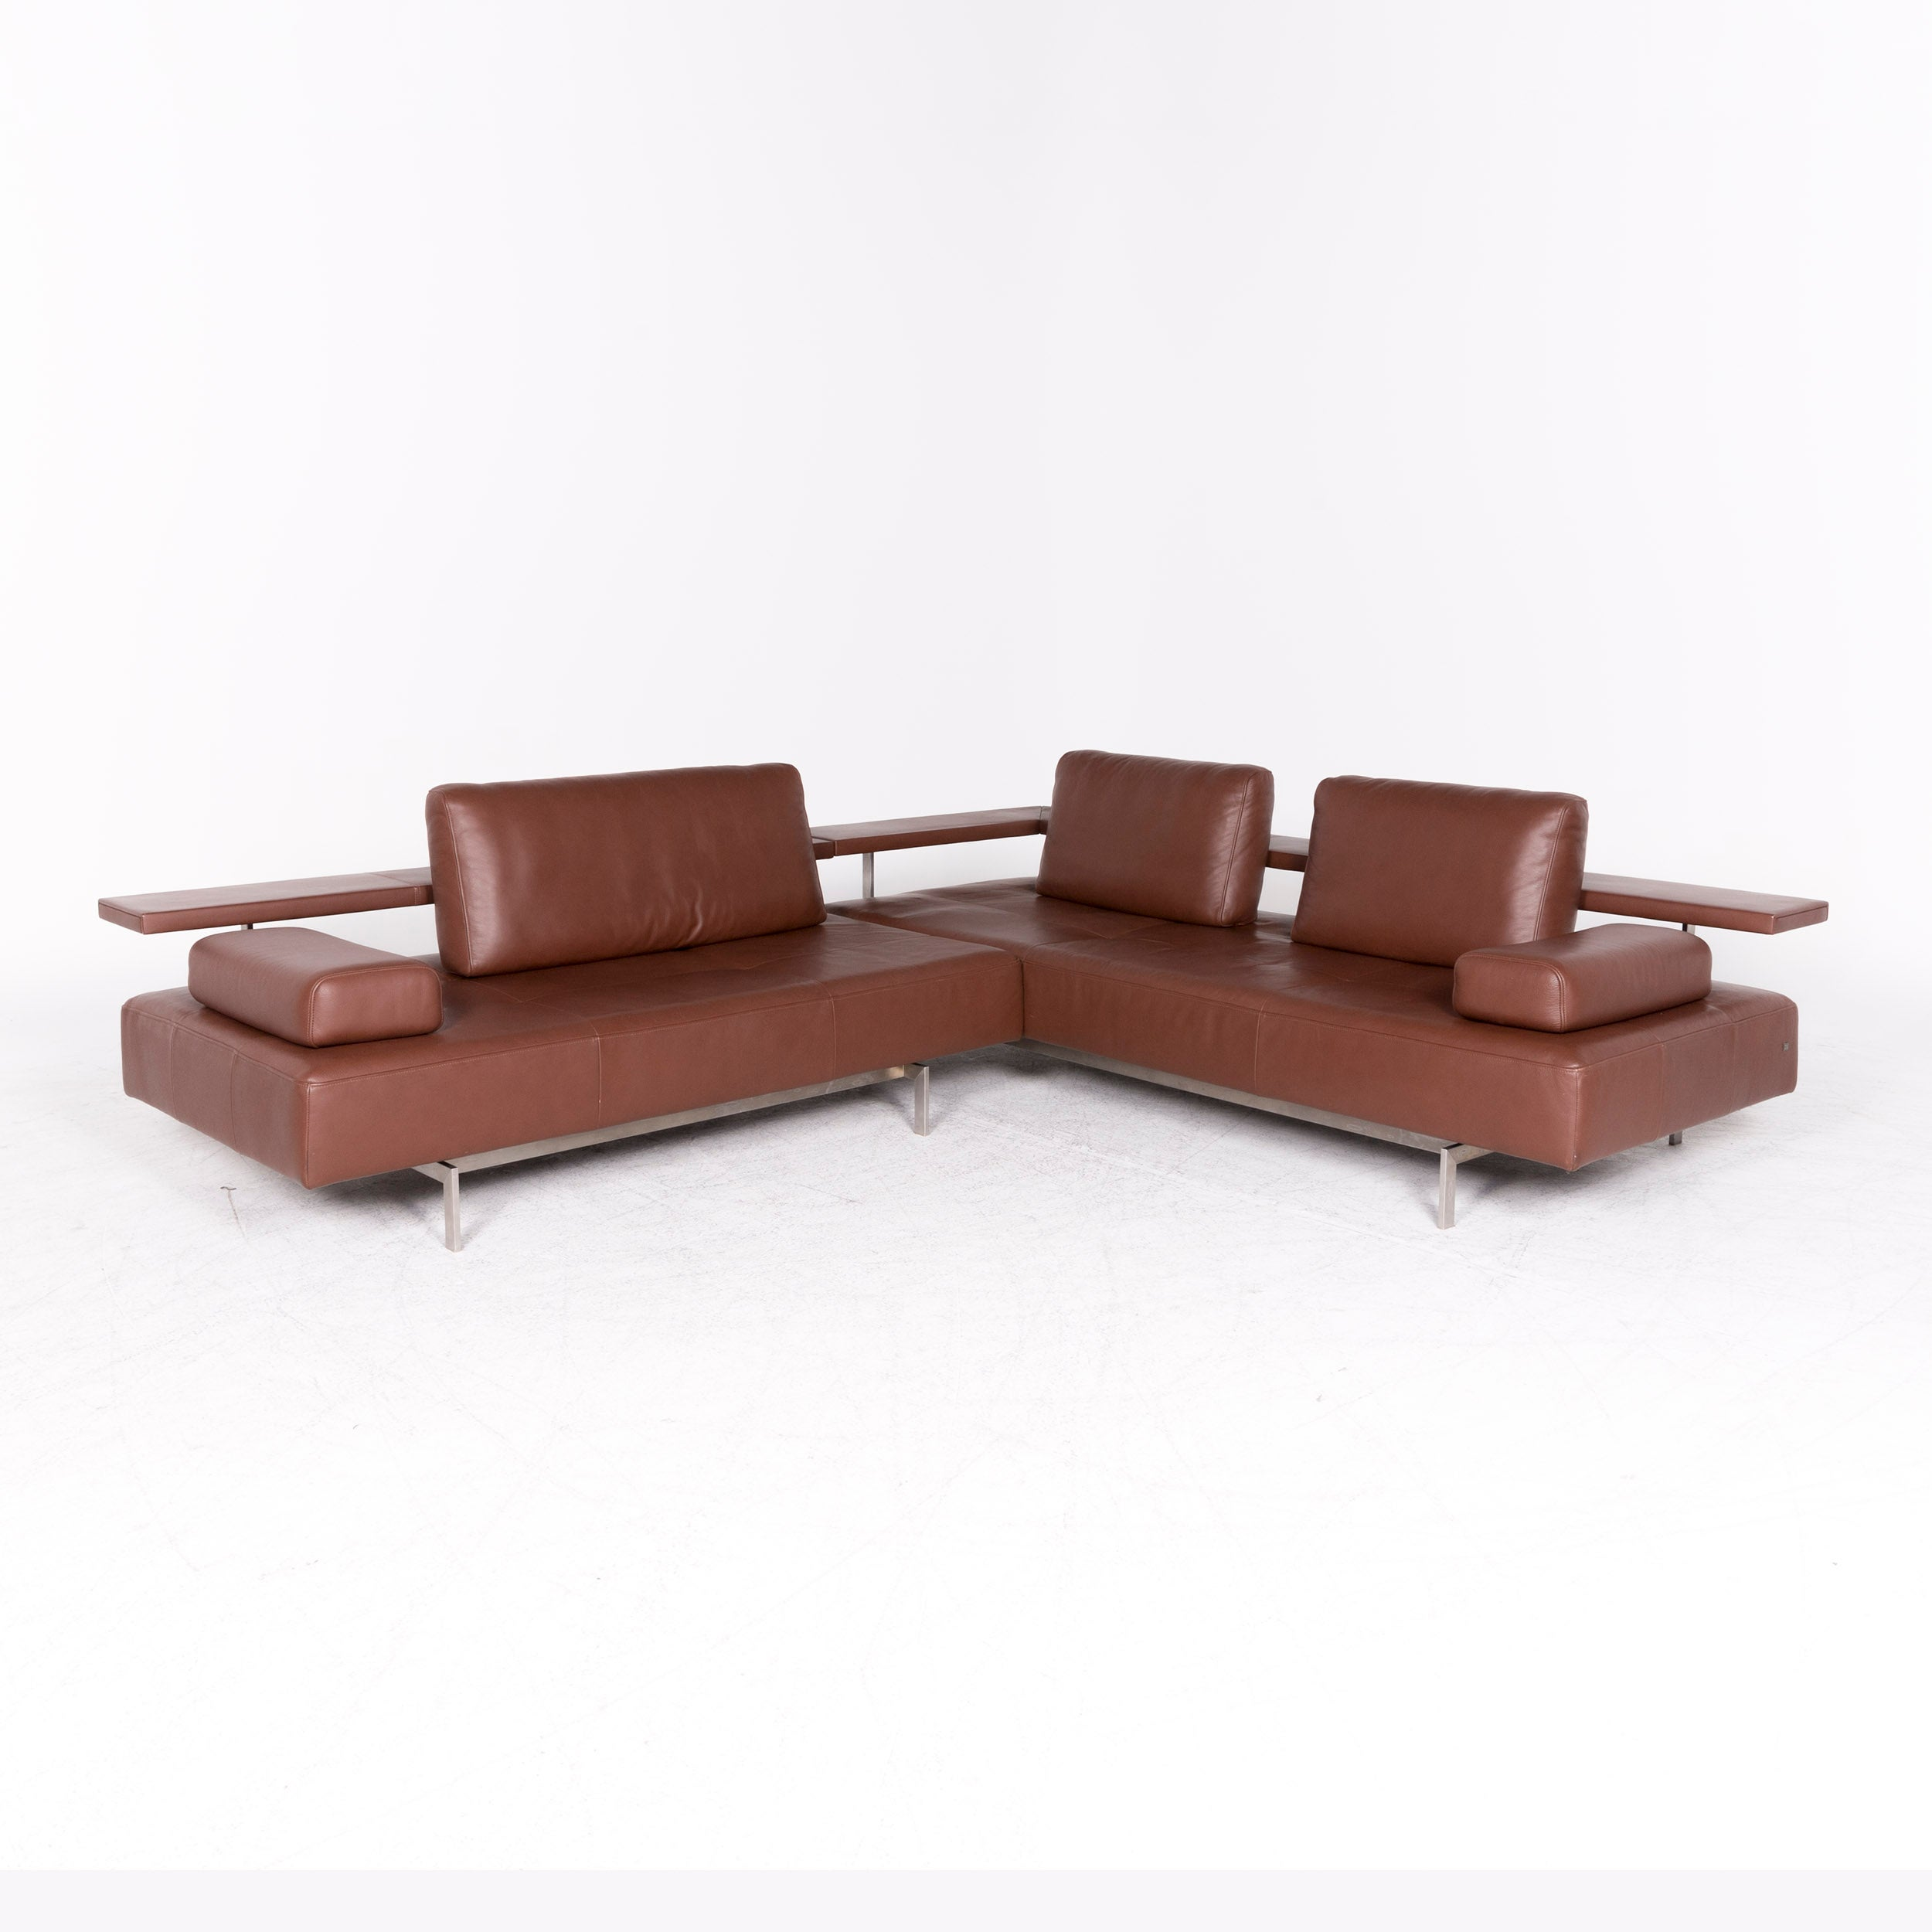 Rolf Benz Dono Designer Leather Corner Sofa Brown Genuine Leather Sofa Couch